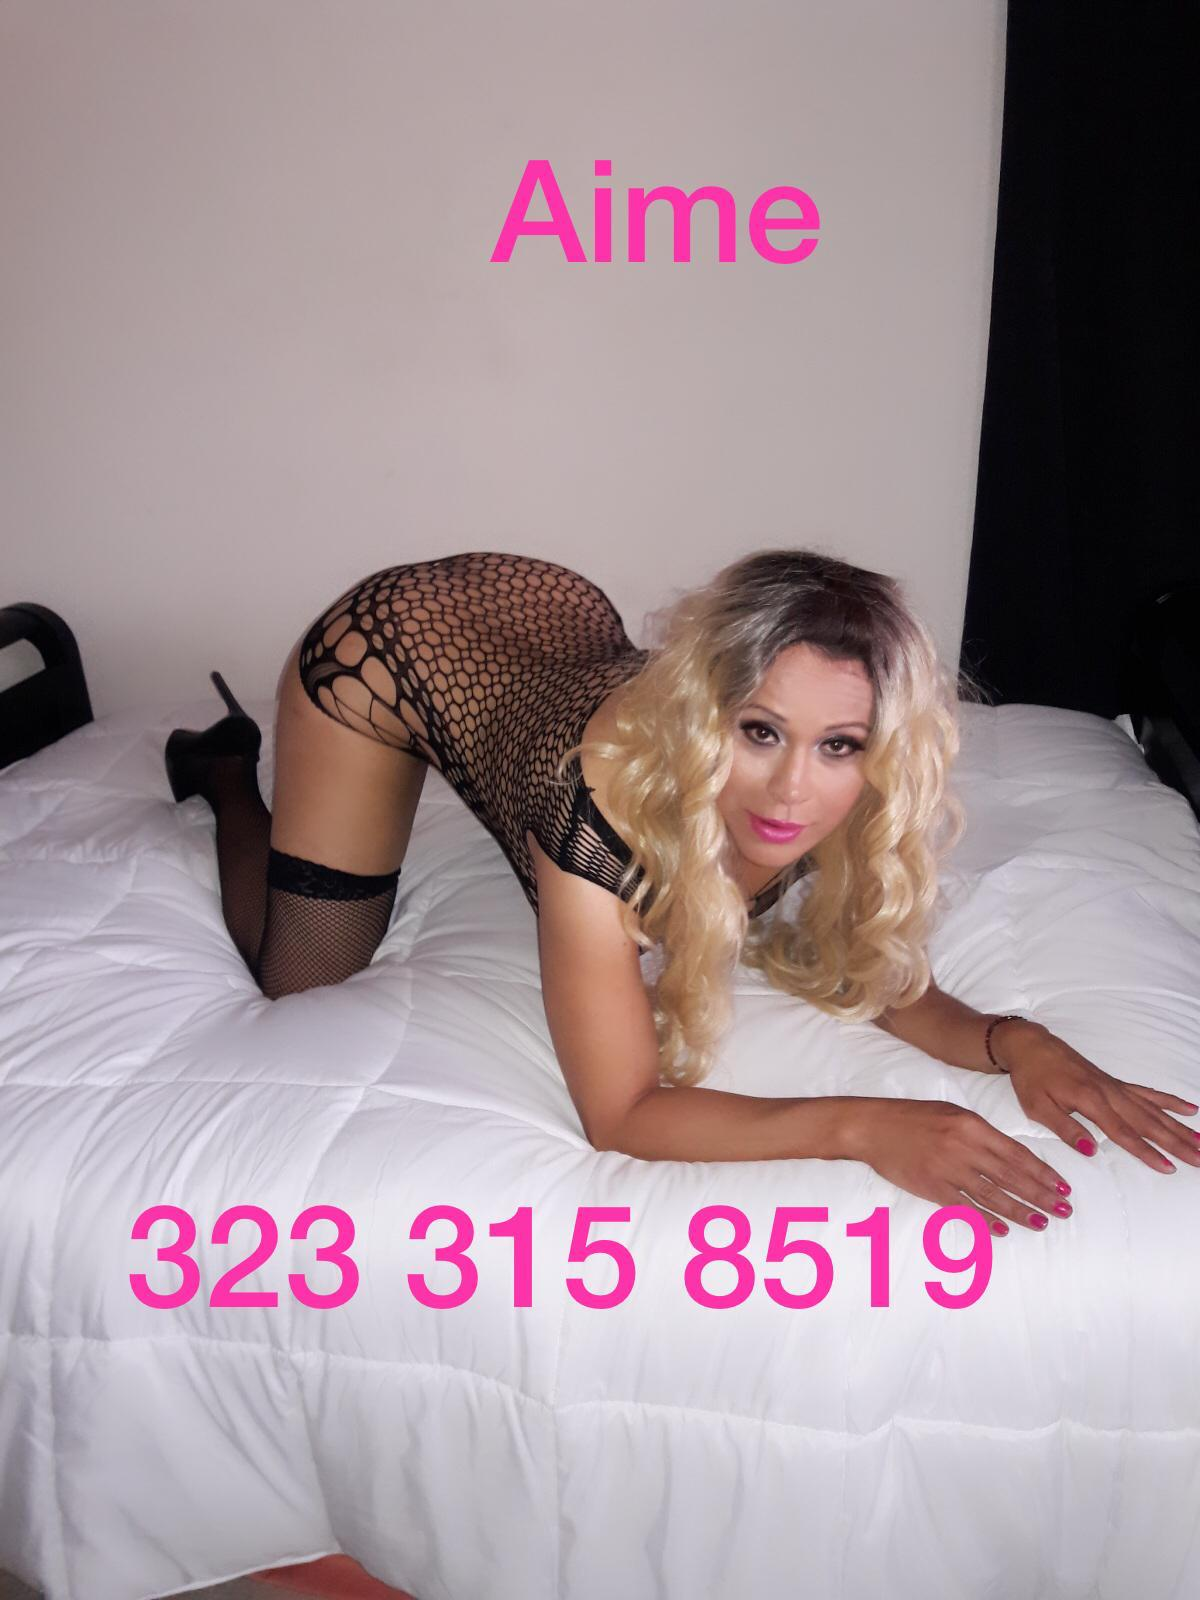 Aimé Profile, Escort in San Diego, 3233158519